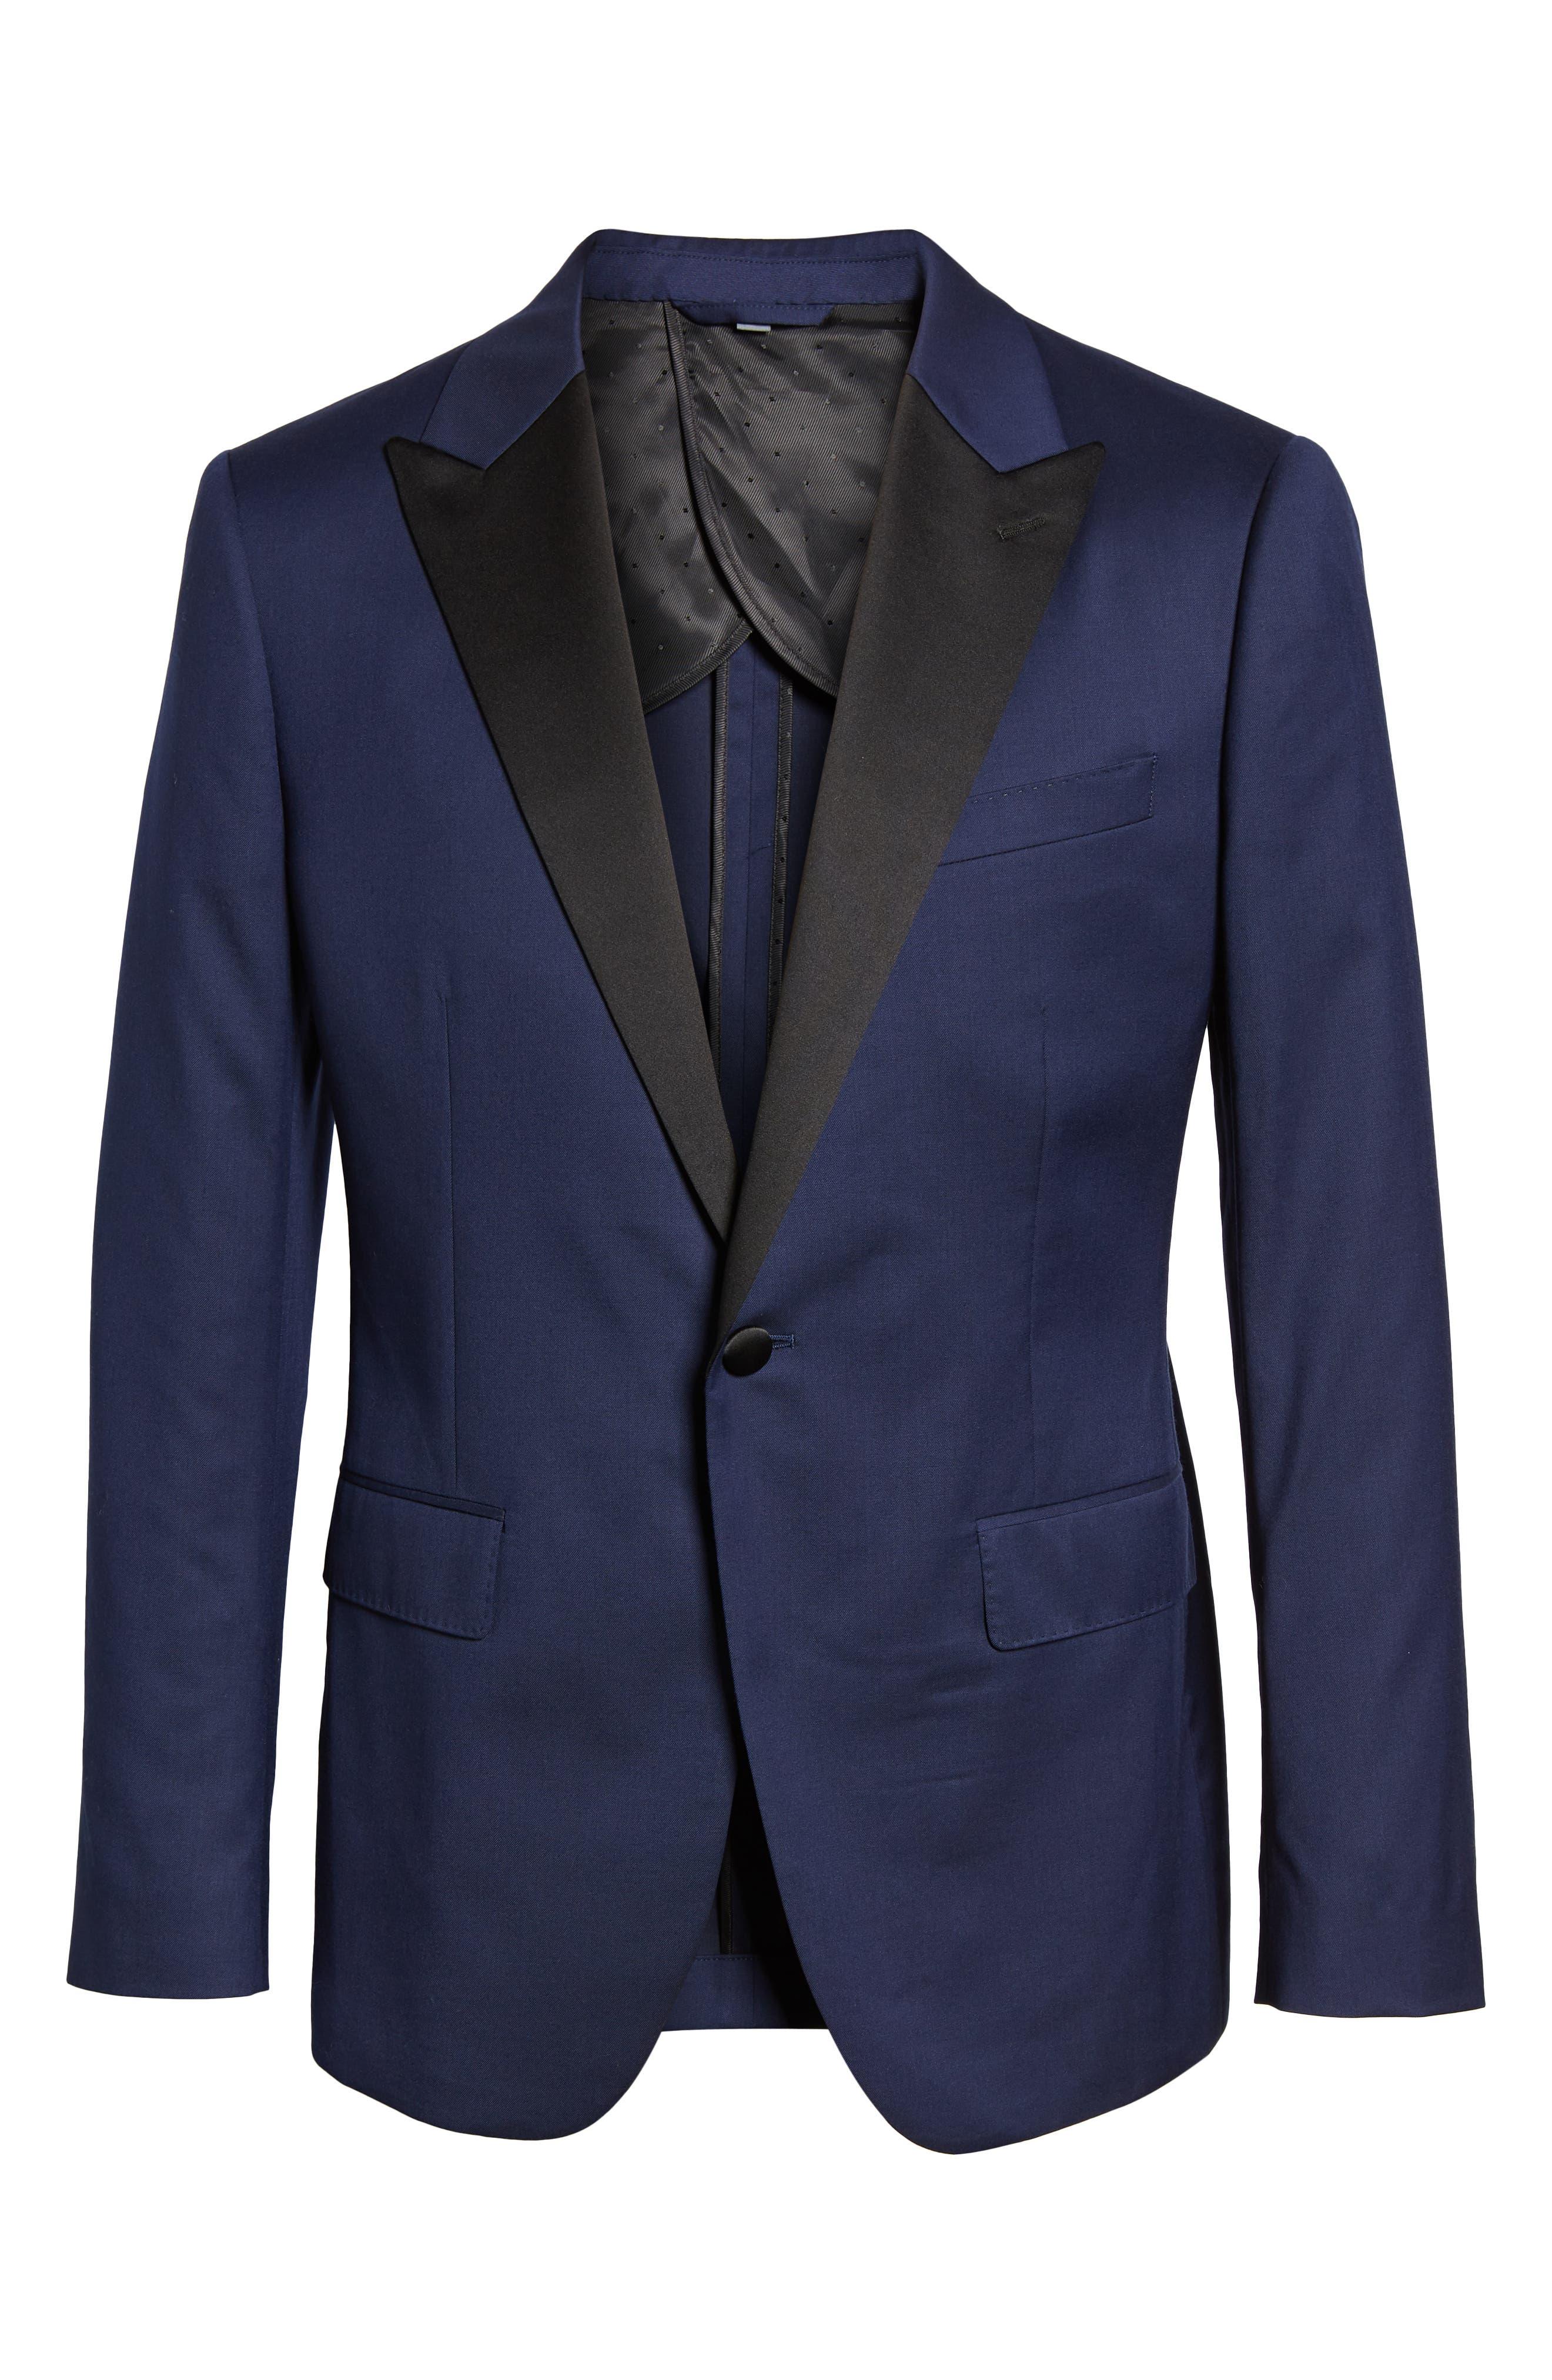 Capstone Slim Fit Italian Wool Blend Dinner Jacket,                             Alternate thumbnail 5, color,                             NAVY